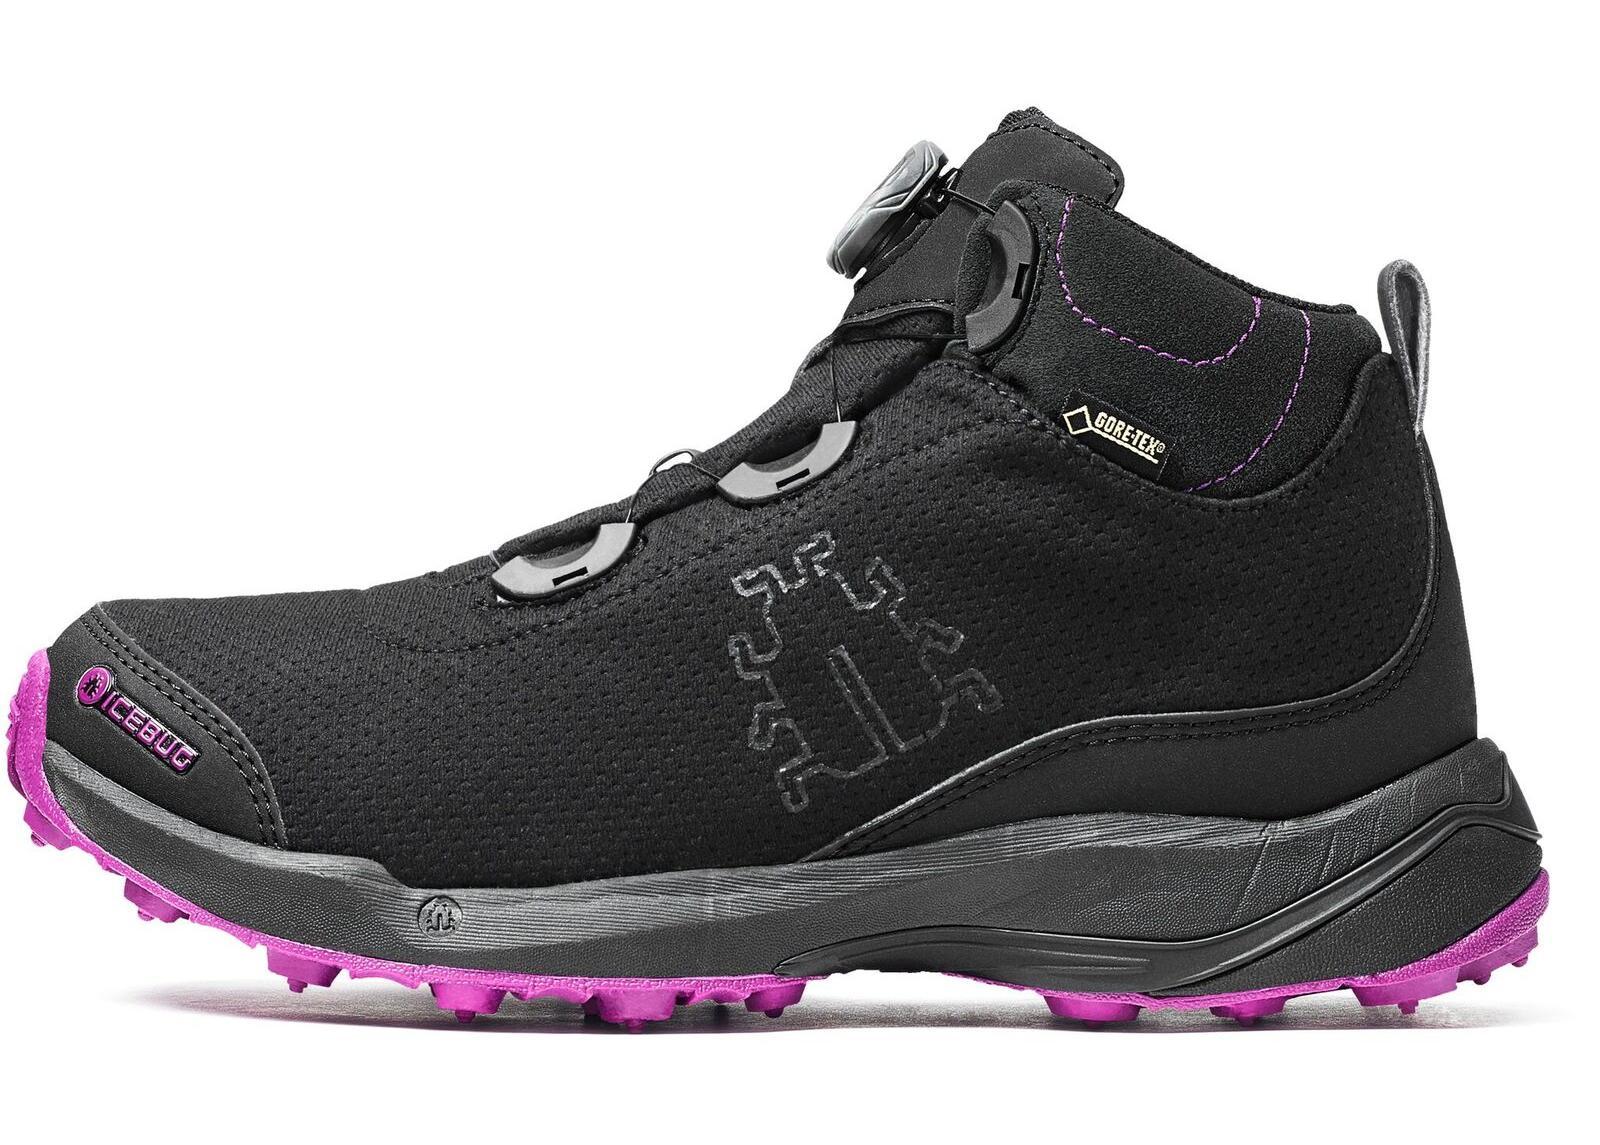 Naisten kengät Detour W RB9X GTX Icebug